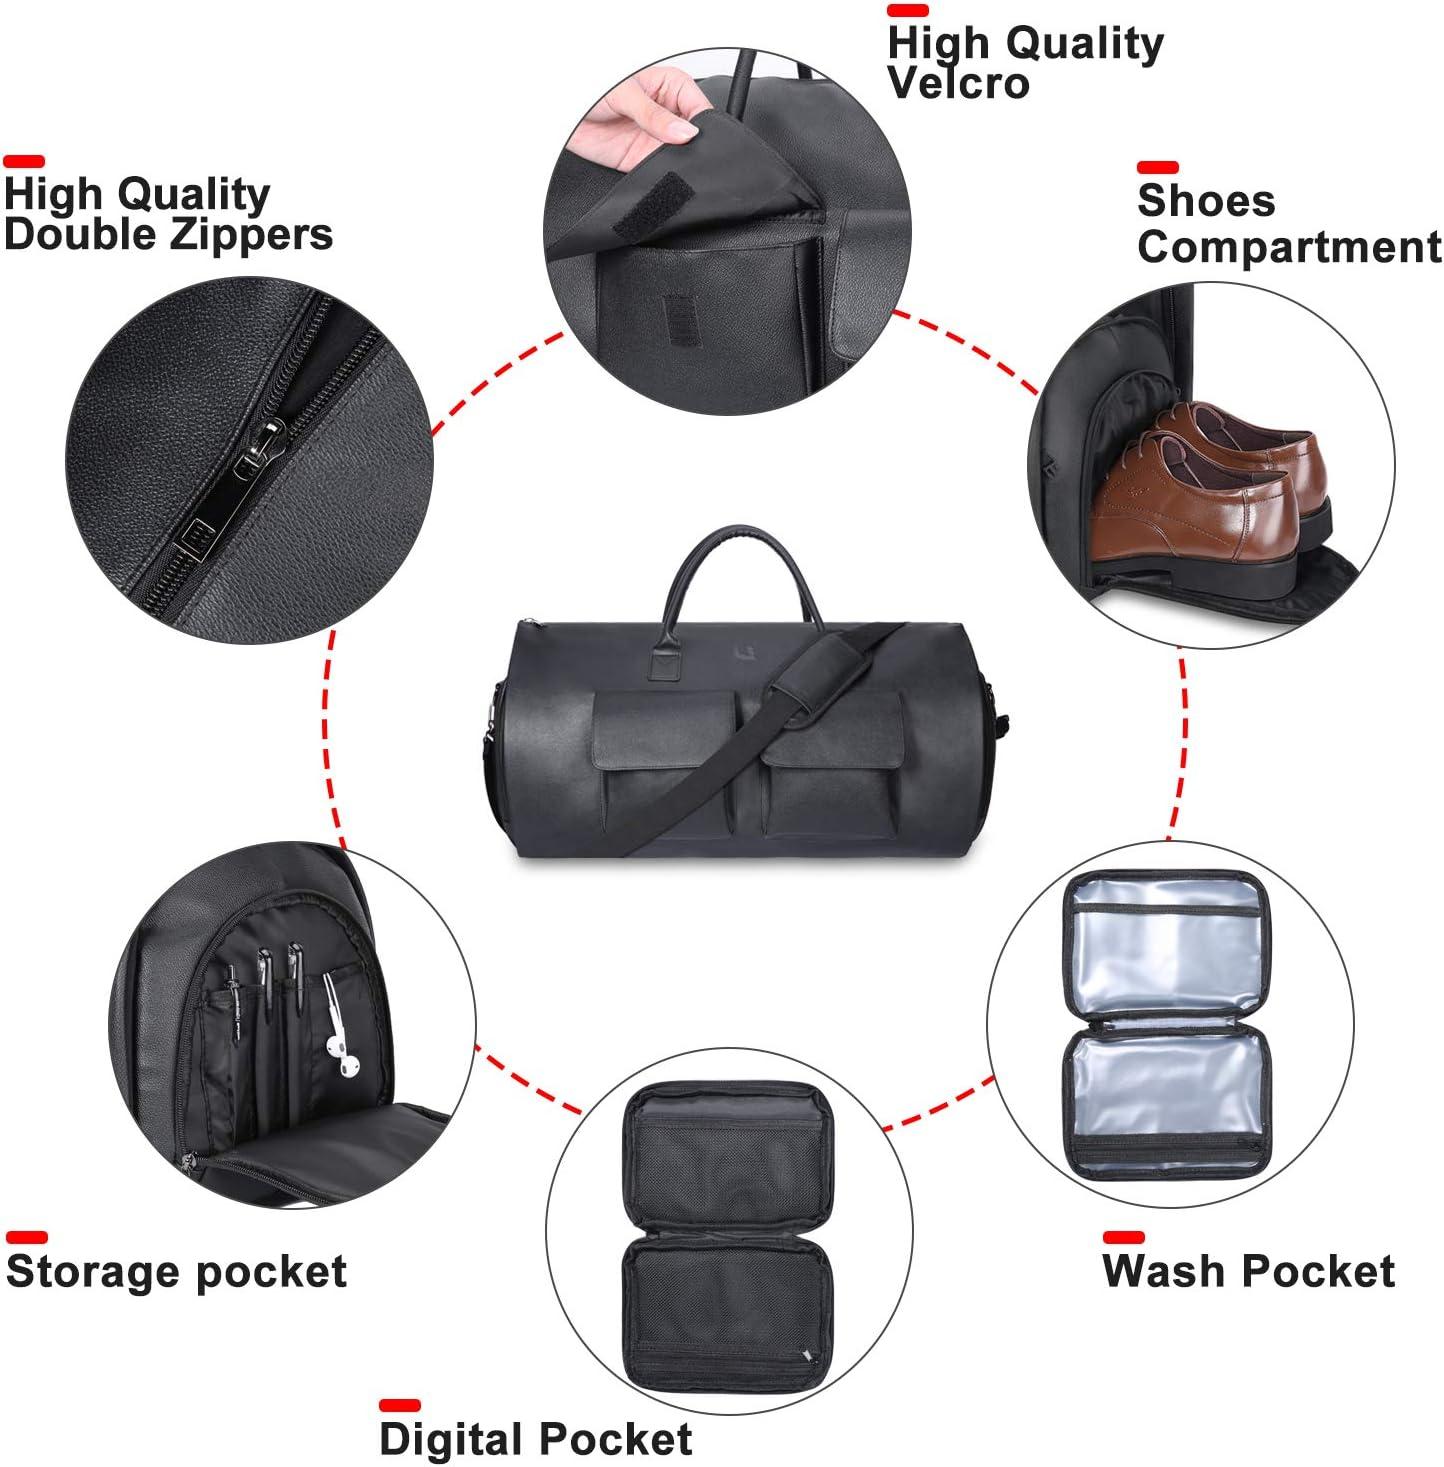 UNIQUEBELLA Travel Suit Bag Oversize Garment Duffel Bag Fiber Leather Suit Carrier Holdall for Men with Shoe Compartment Black